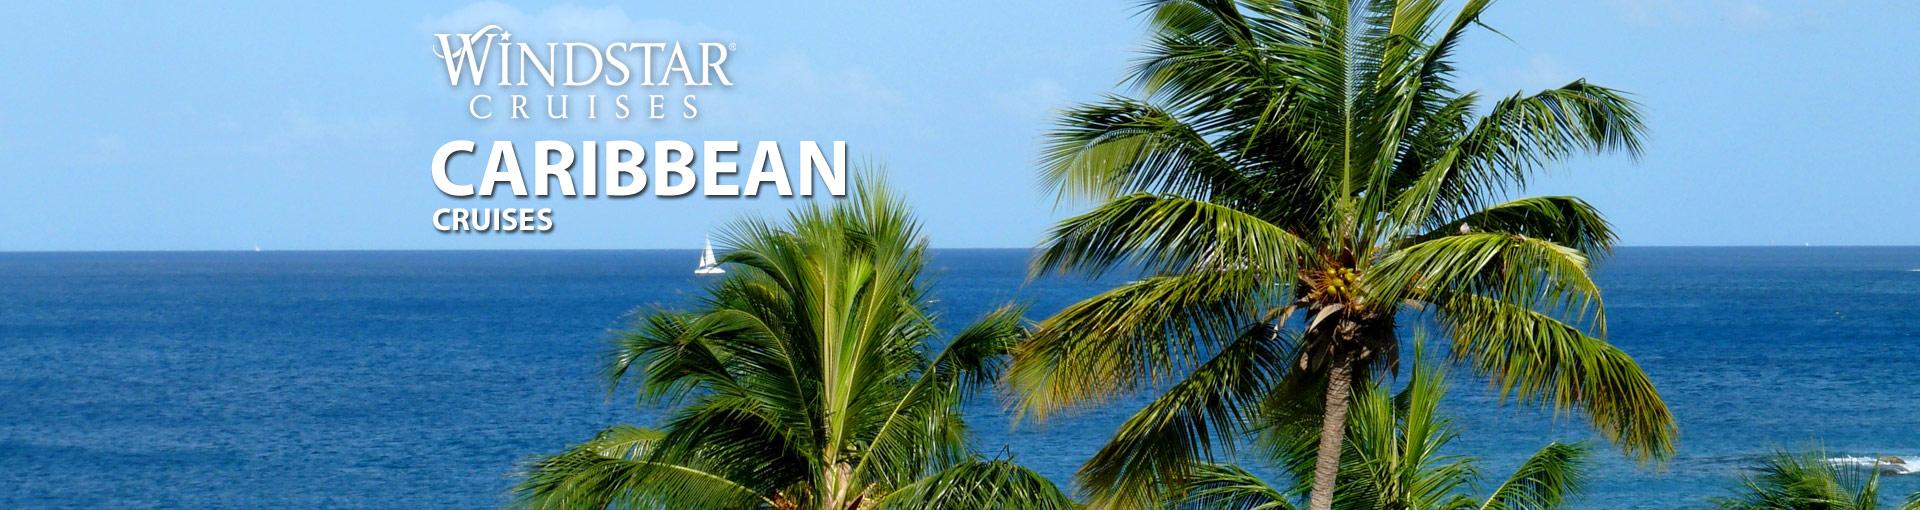 Windstar Caribbean Cruises